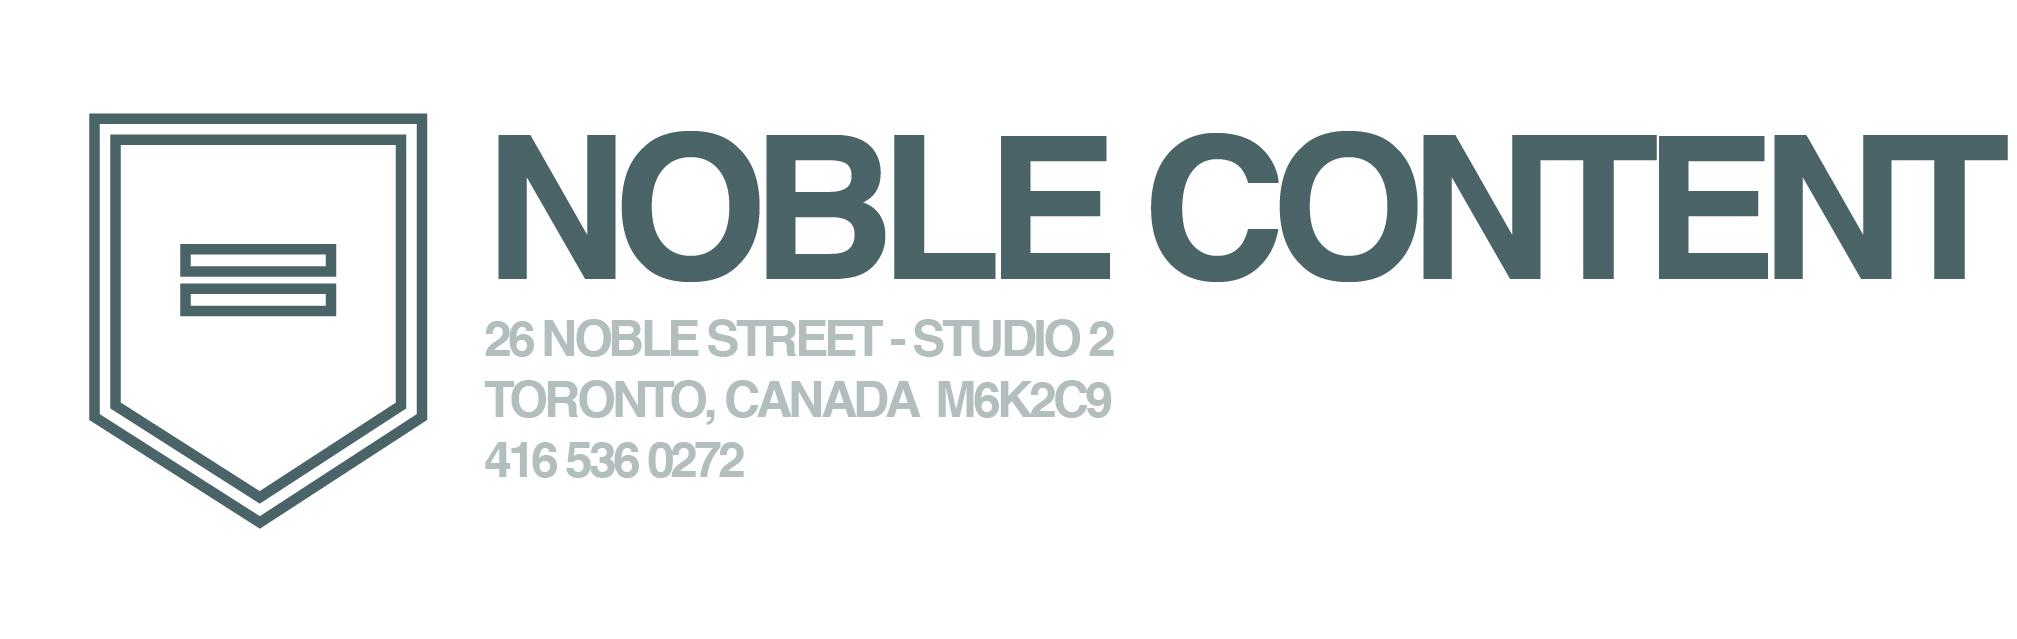 NobleContent_Web-03.jpg